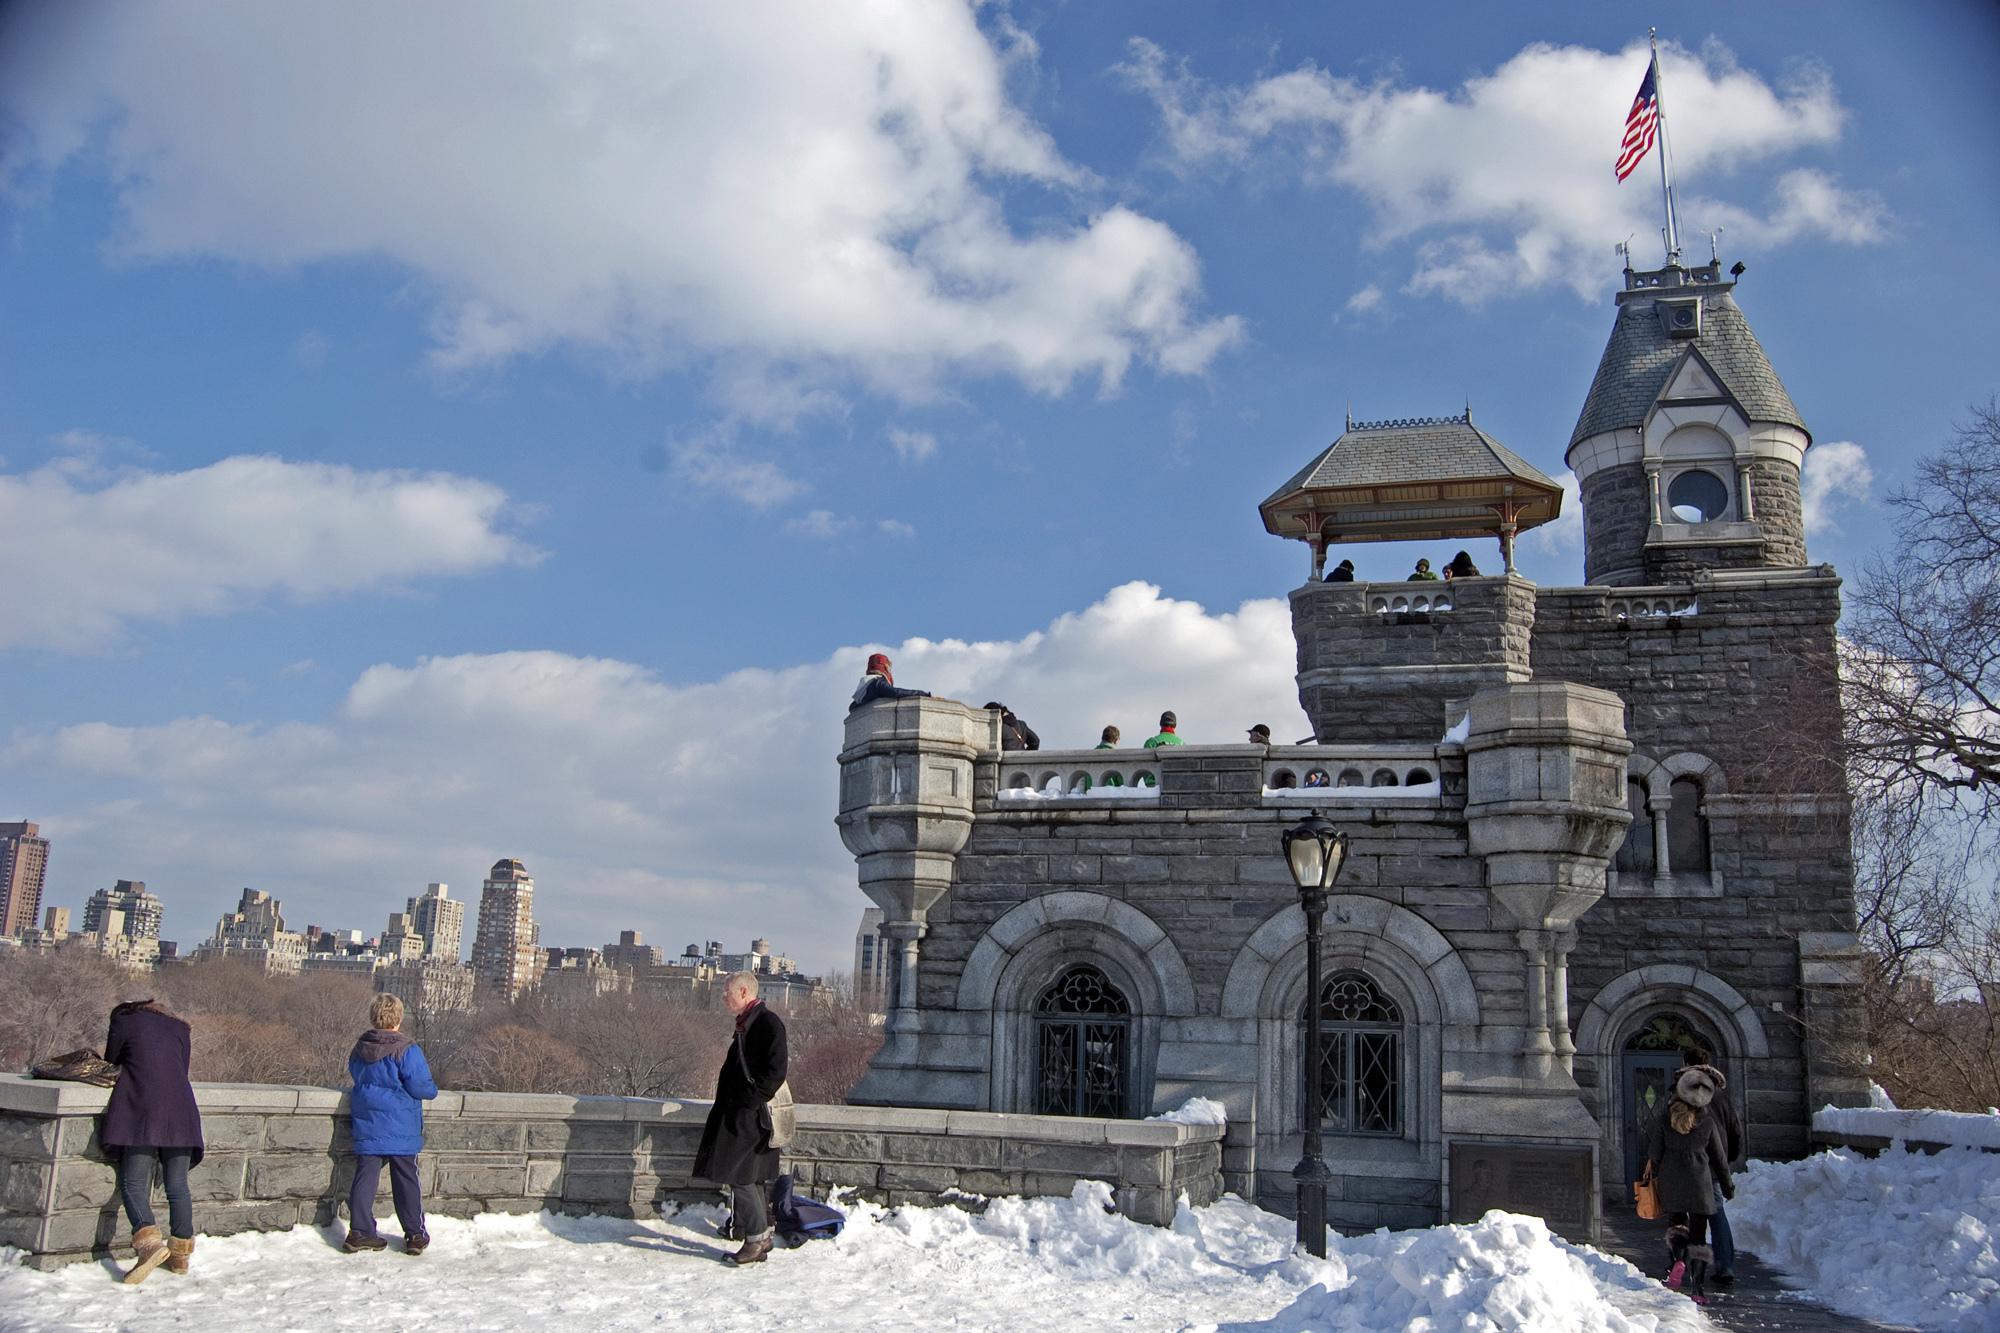 Central Park Conservancy Ice Festival